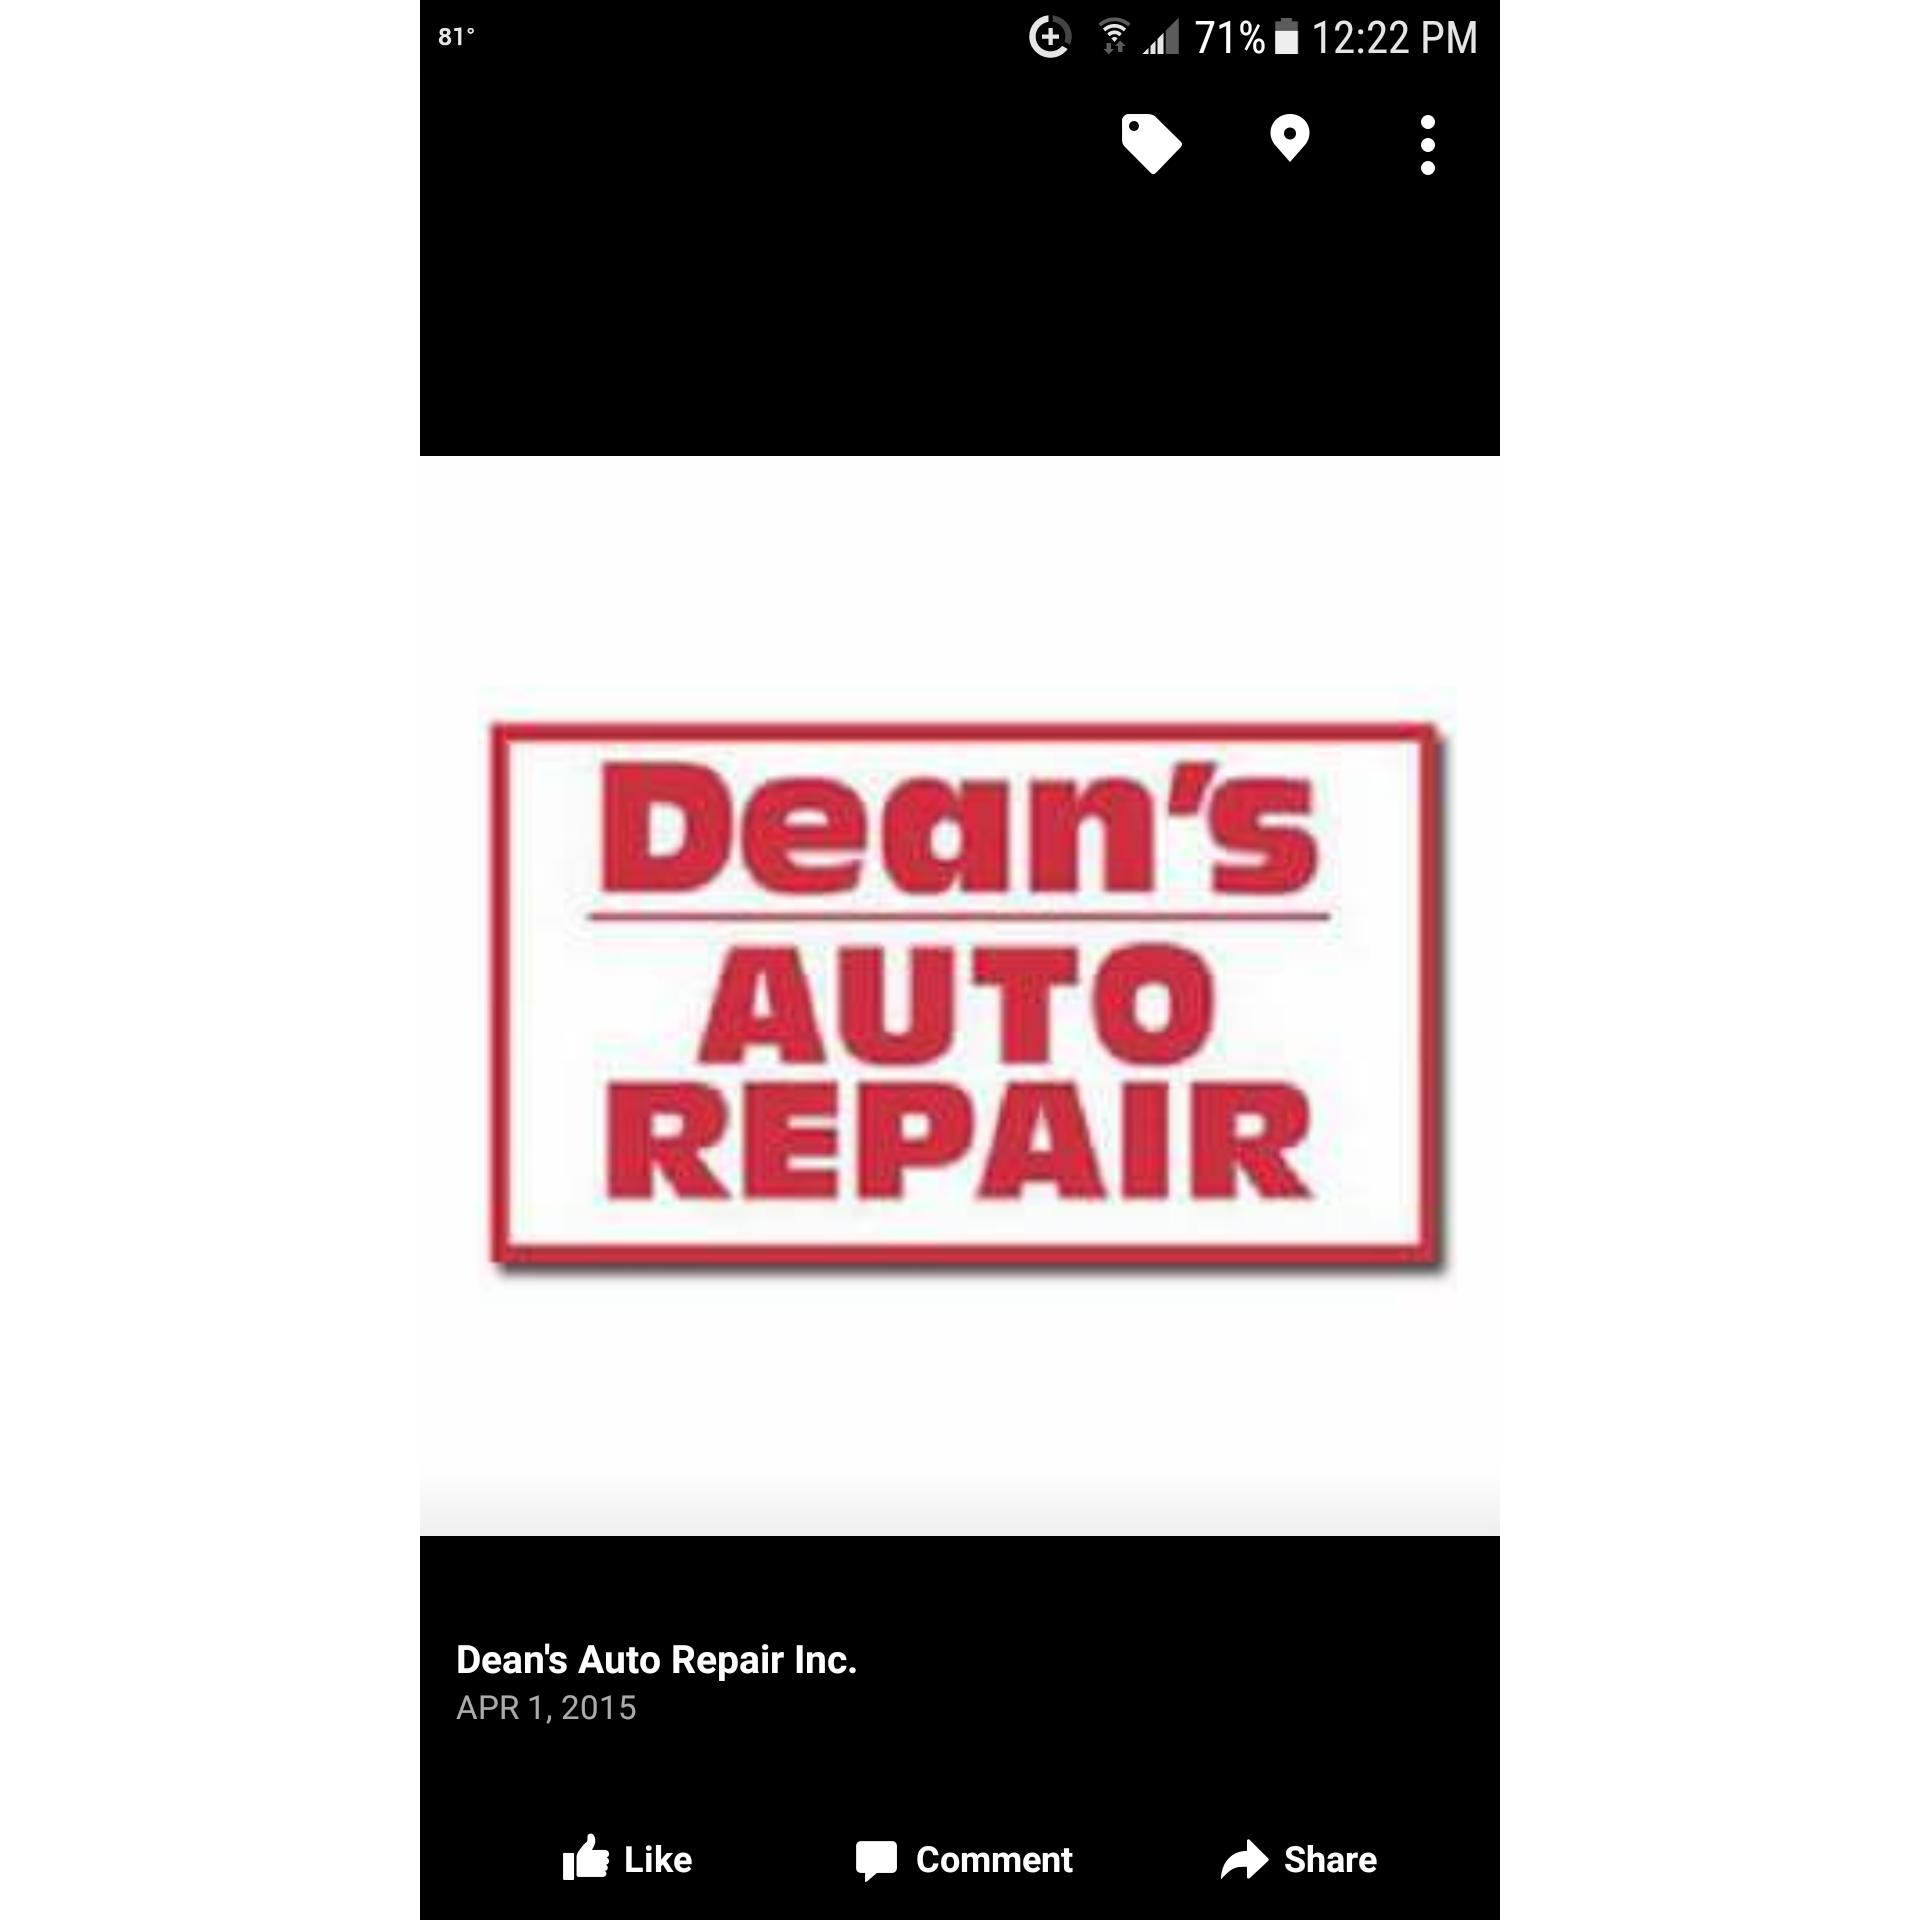 Dean's Auto Repair Inc